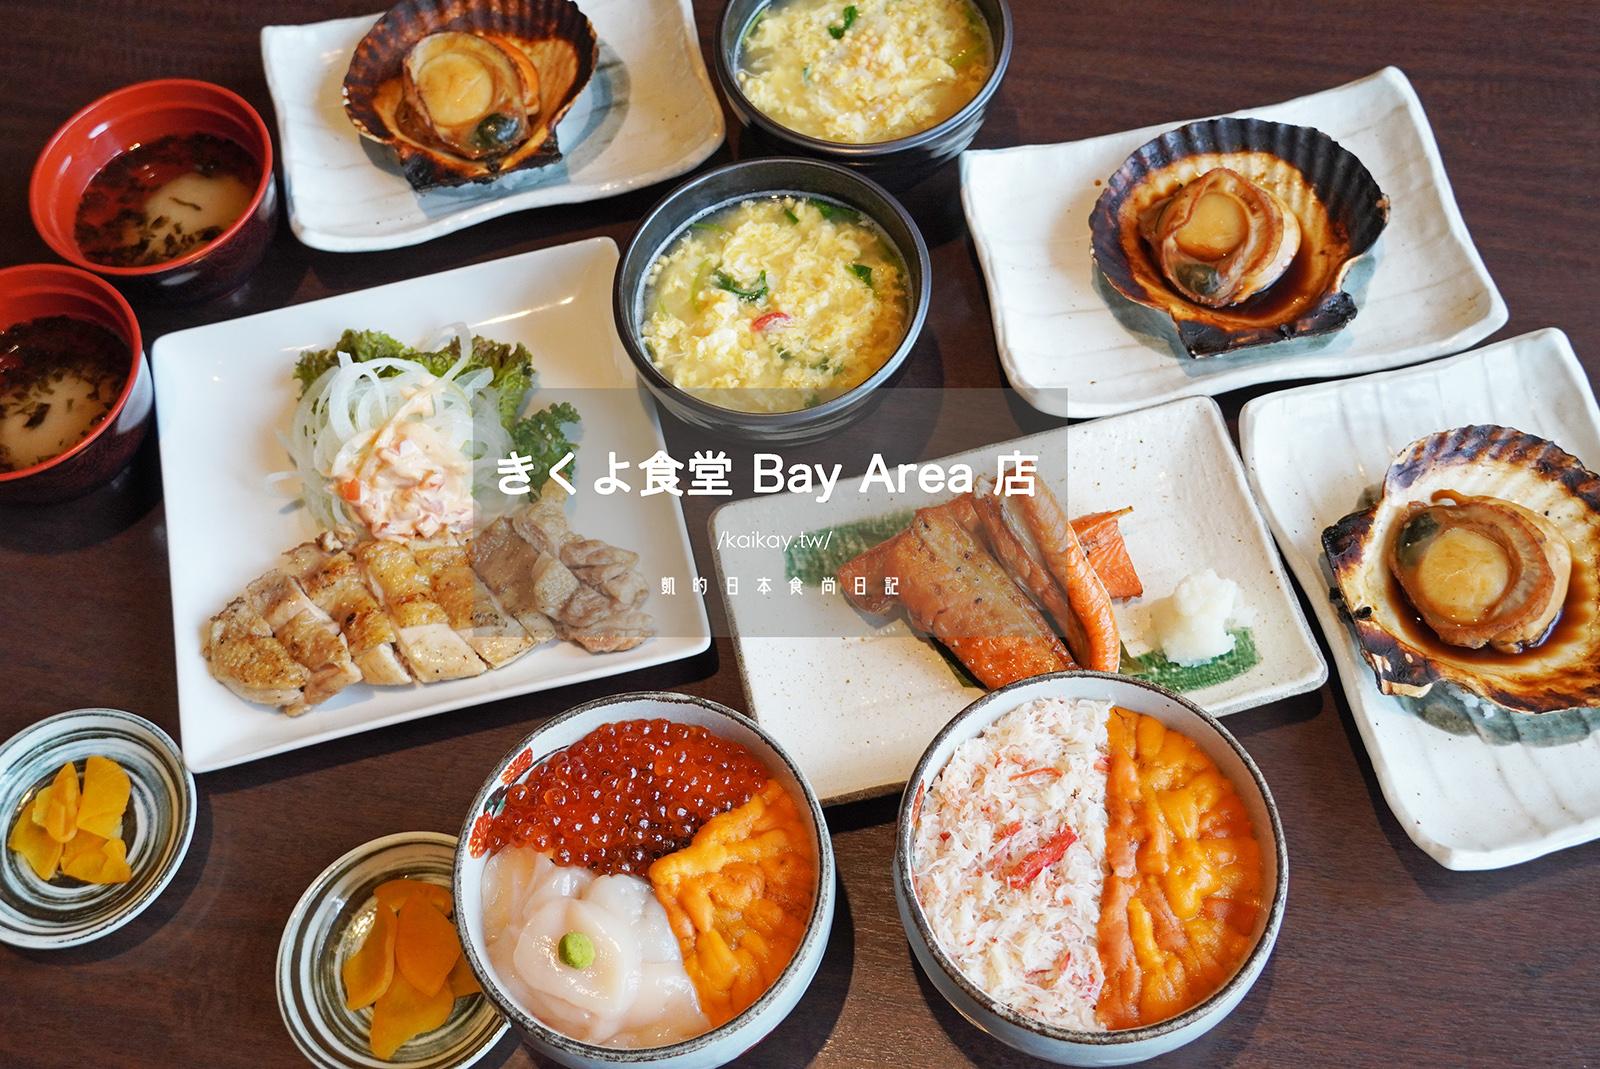 ☆【2020。北海道】きくよ食堂 Bay Area 店。函館必吃美食:招牌海鮮丼 @凱的日本食尚日記